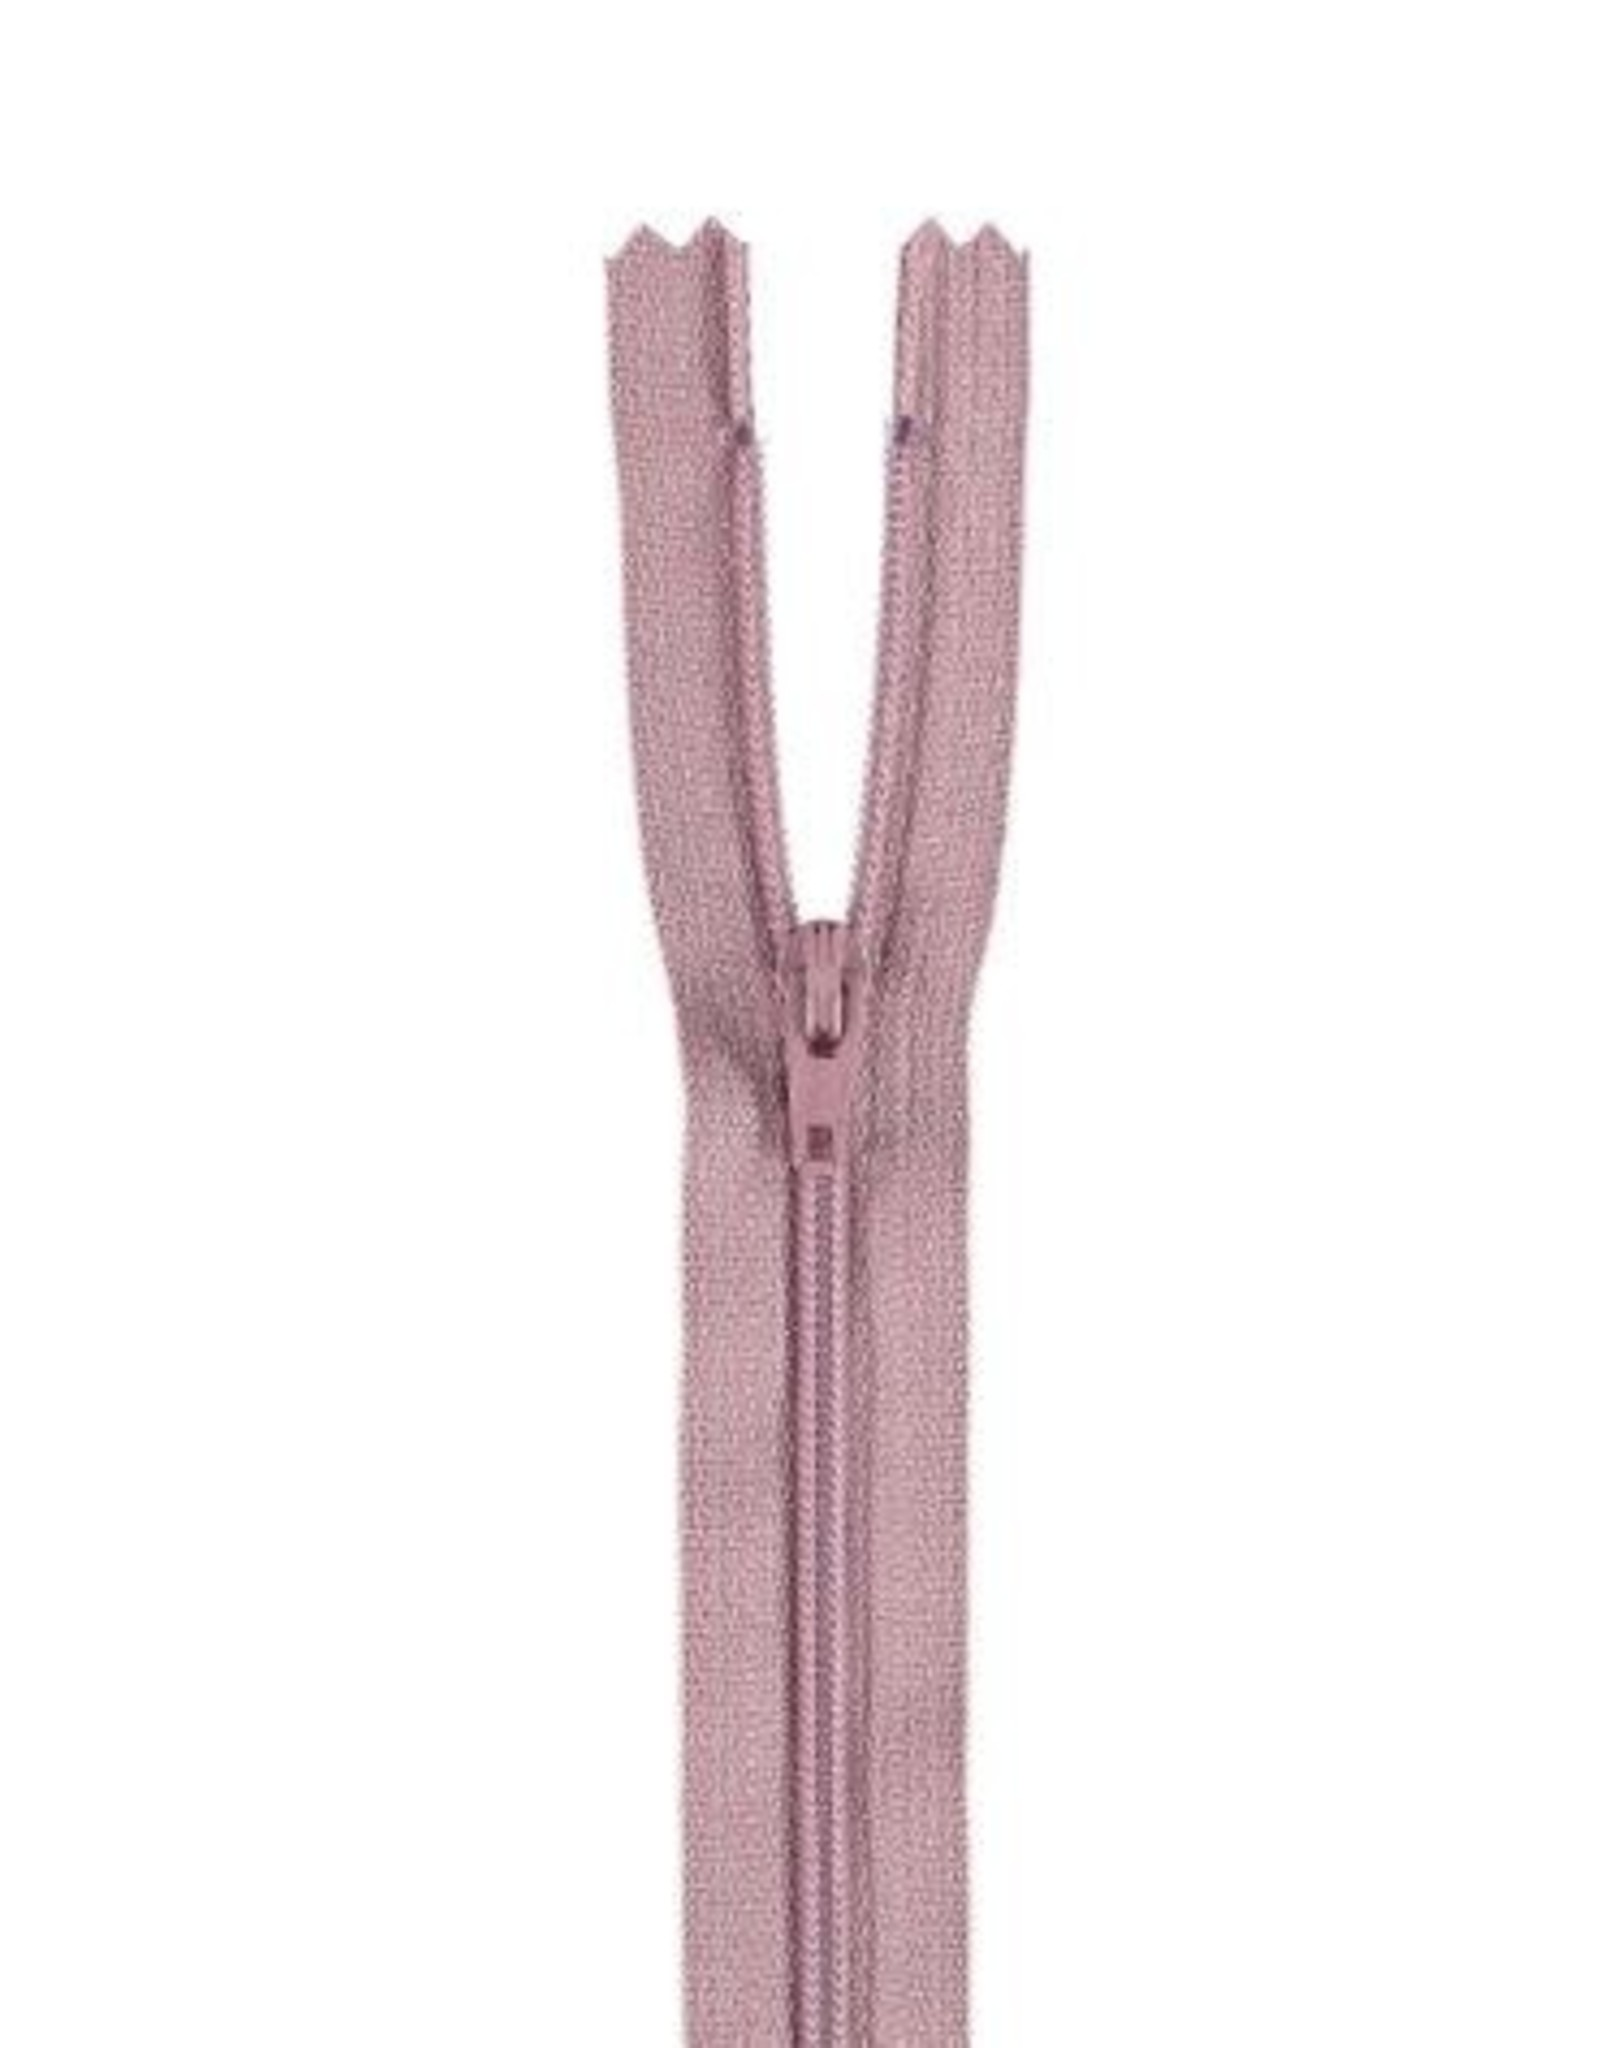 YKK Spiraalrits niet-DB 3mm oud roze 069-25cm